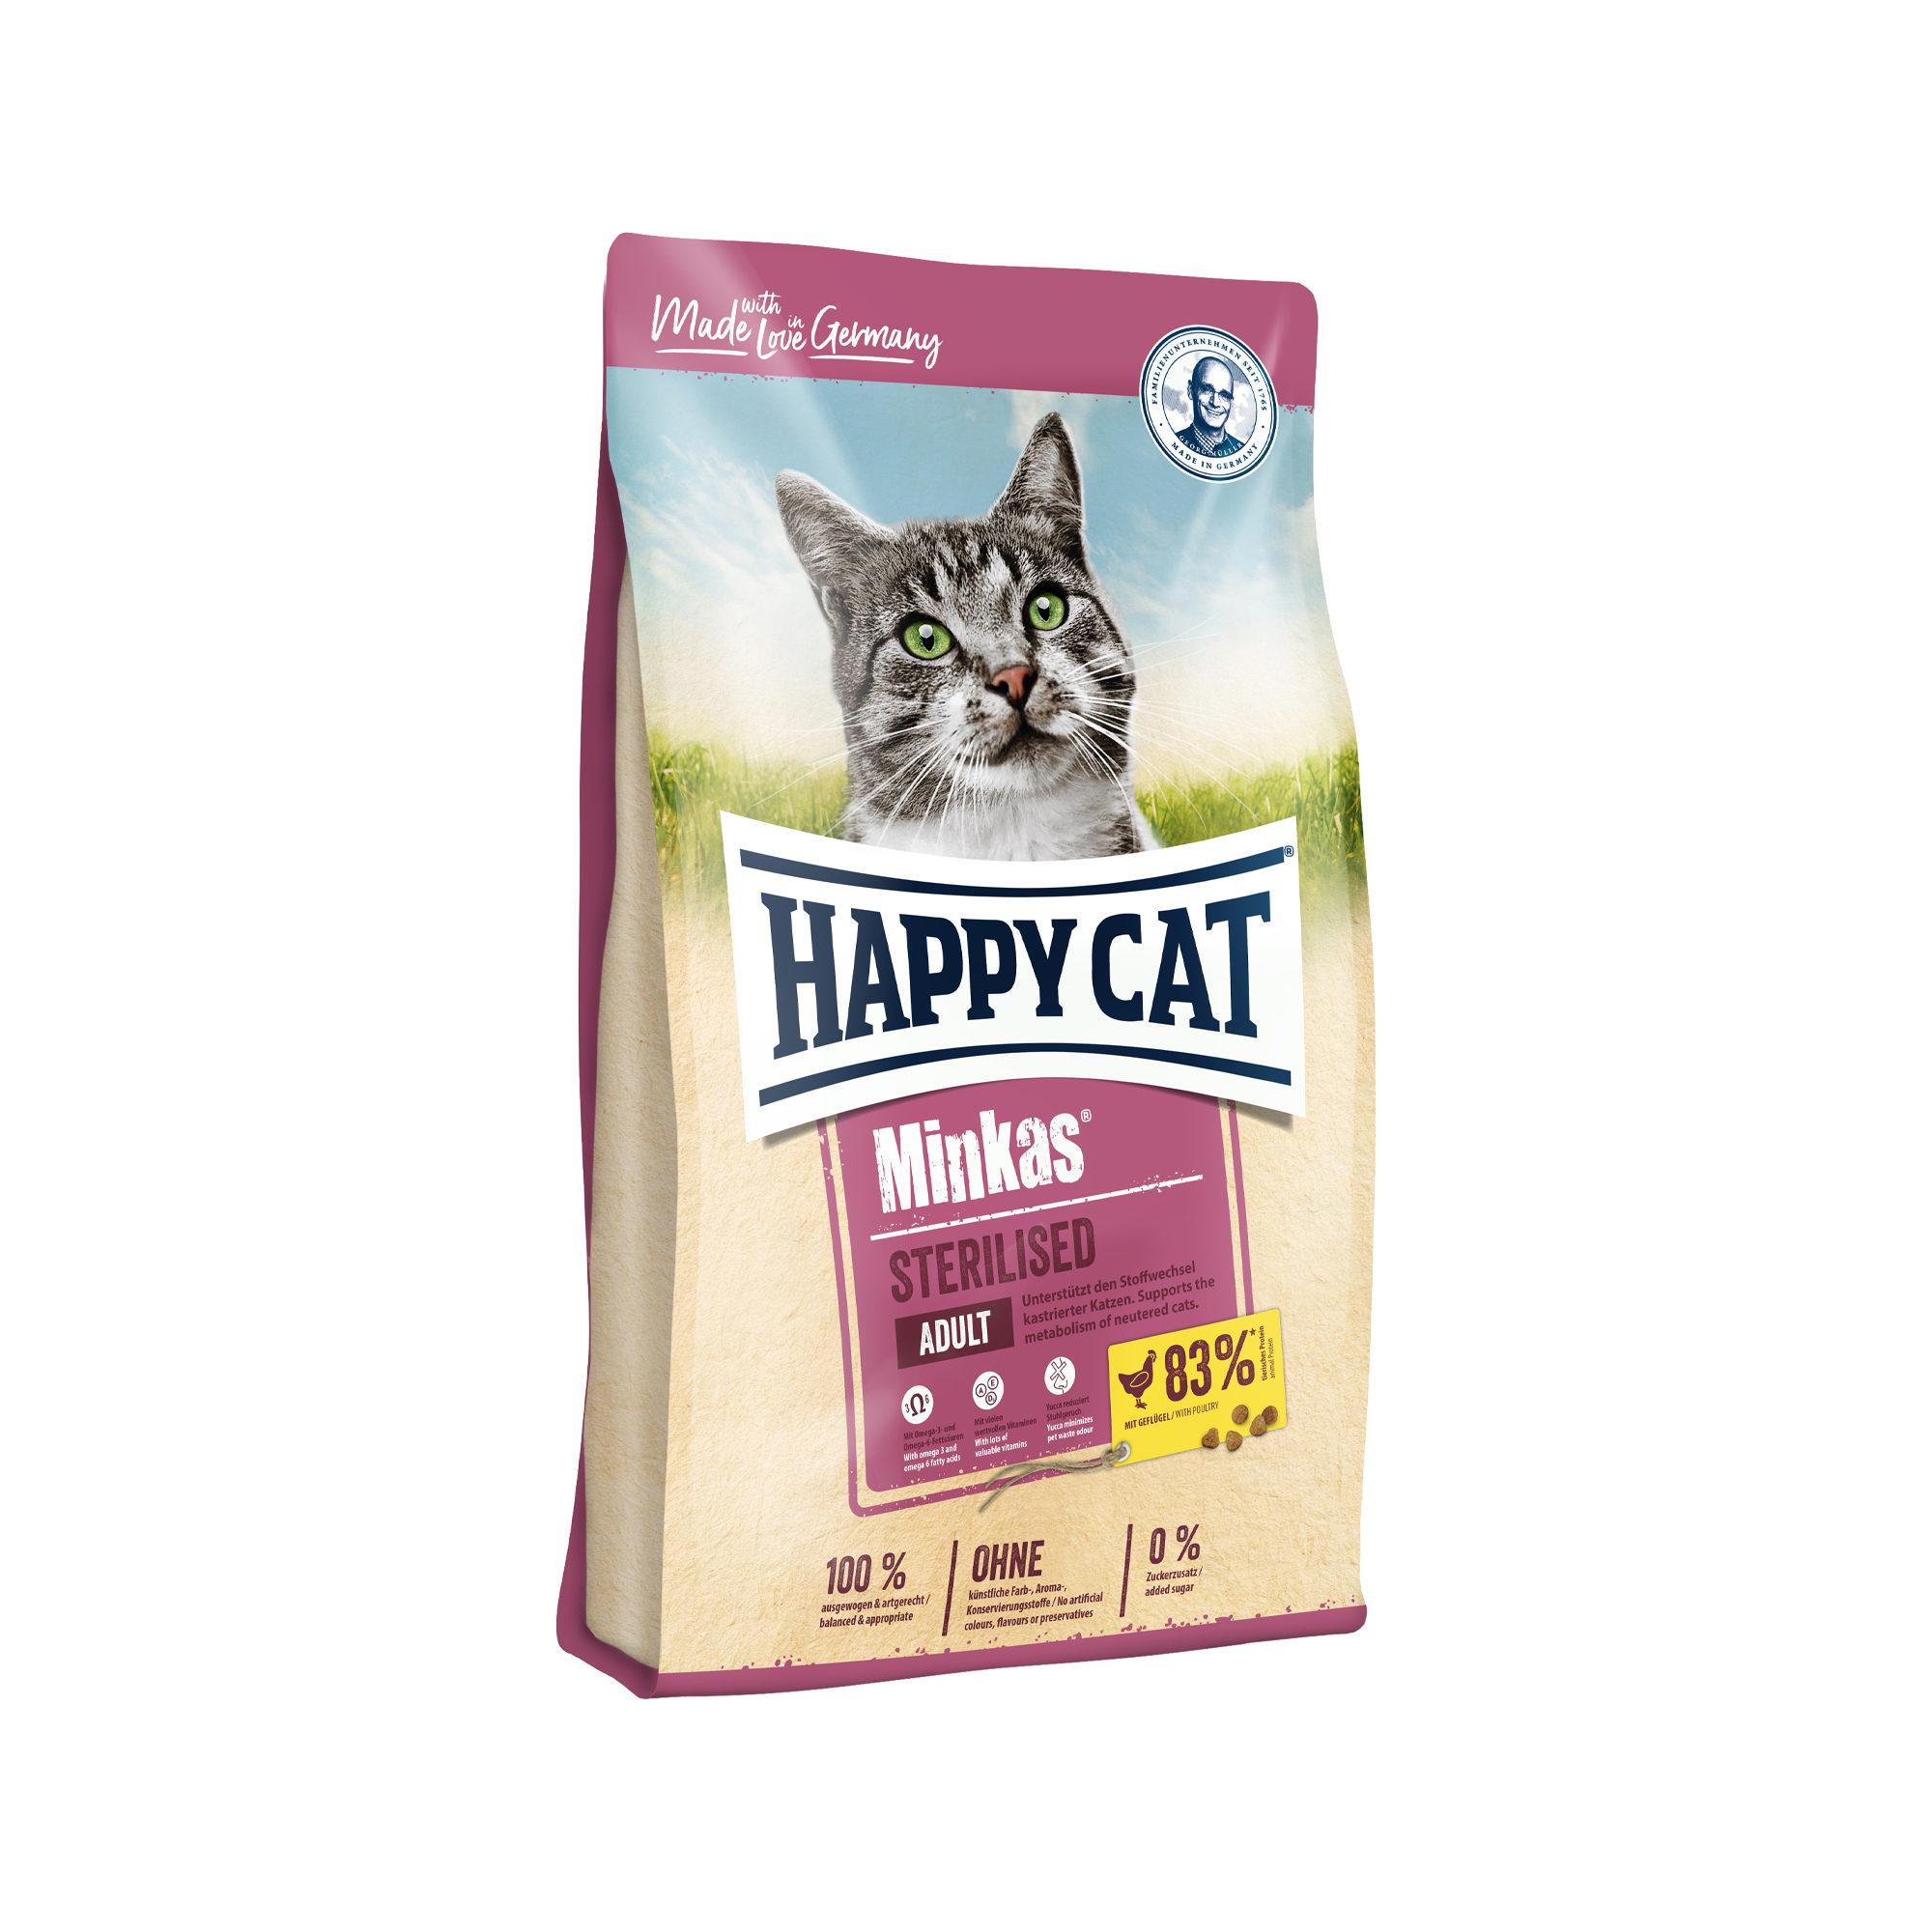 Happy Cat Minkas Adult Sterilised Katzenfutter - Geflügel